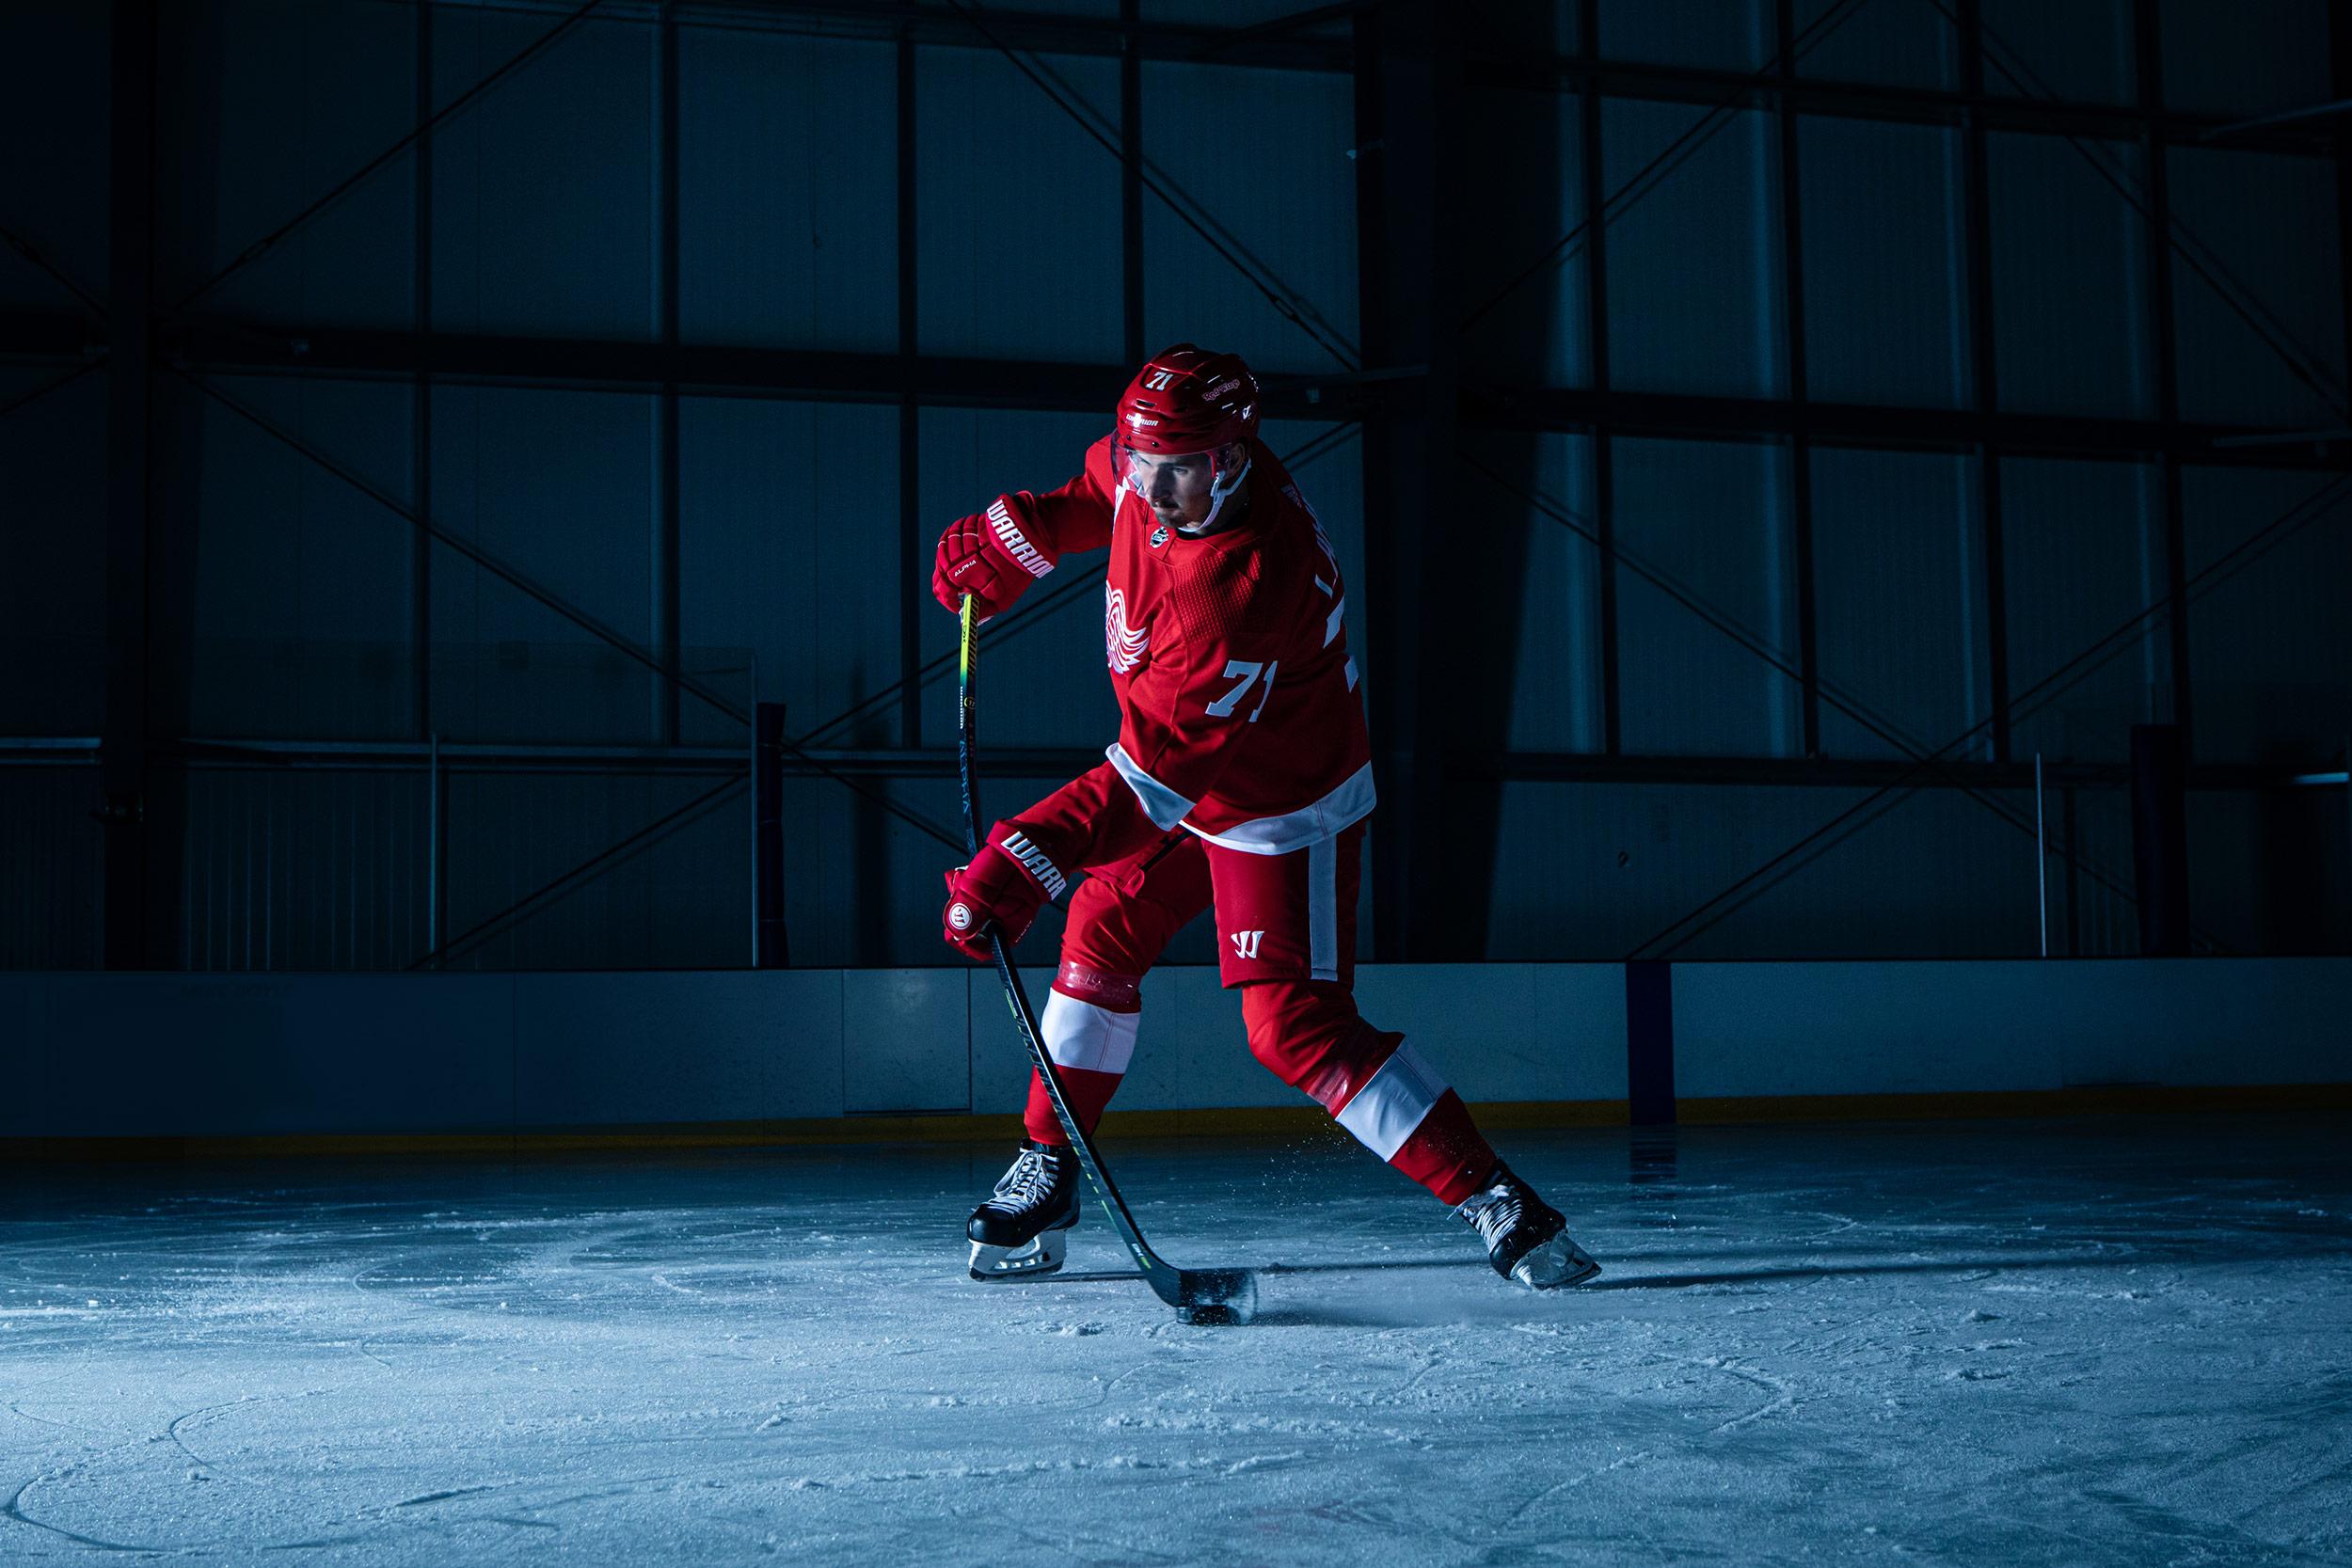 FAIR-FOLK-DYLAN-LARKIN-HOCKEY-NHL-1.jpg